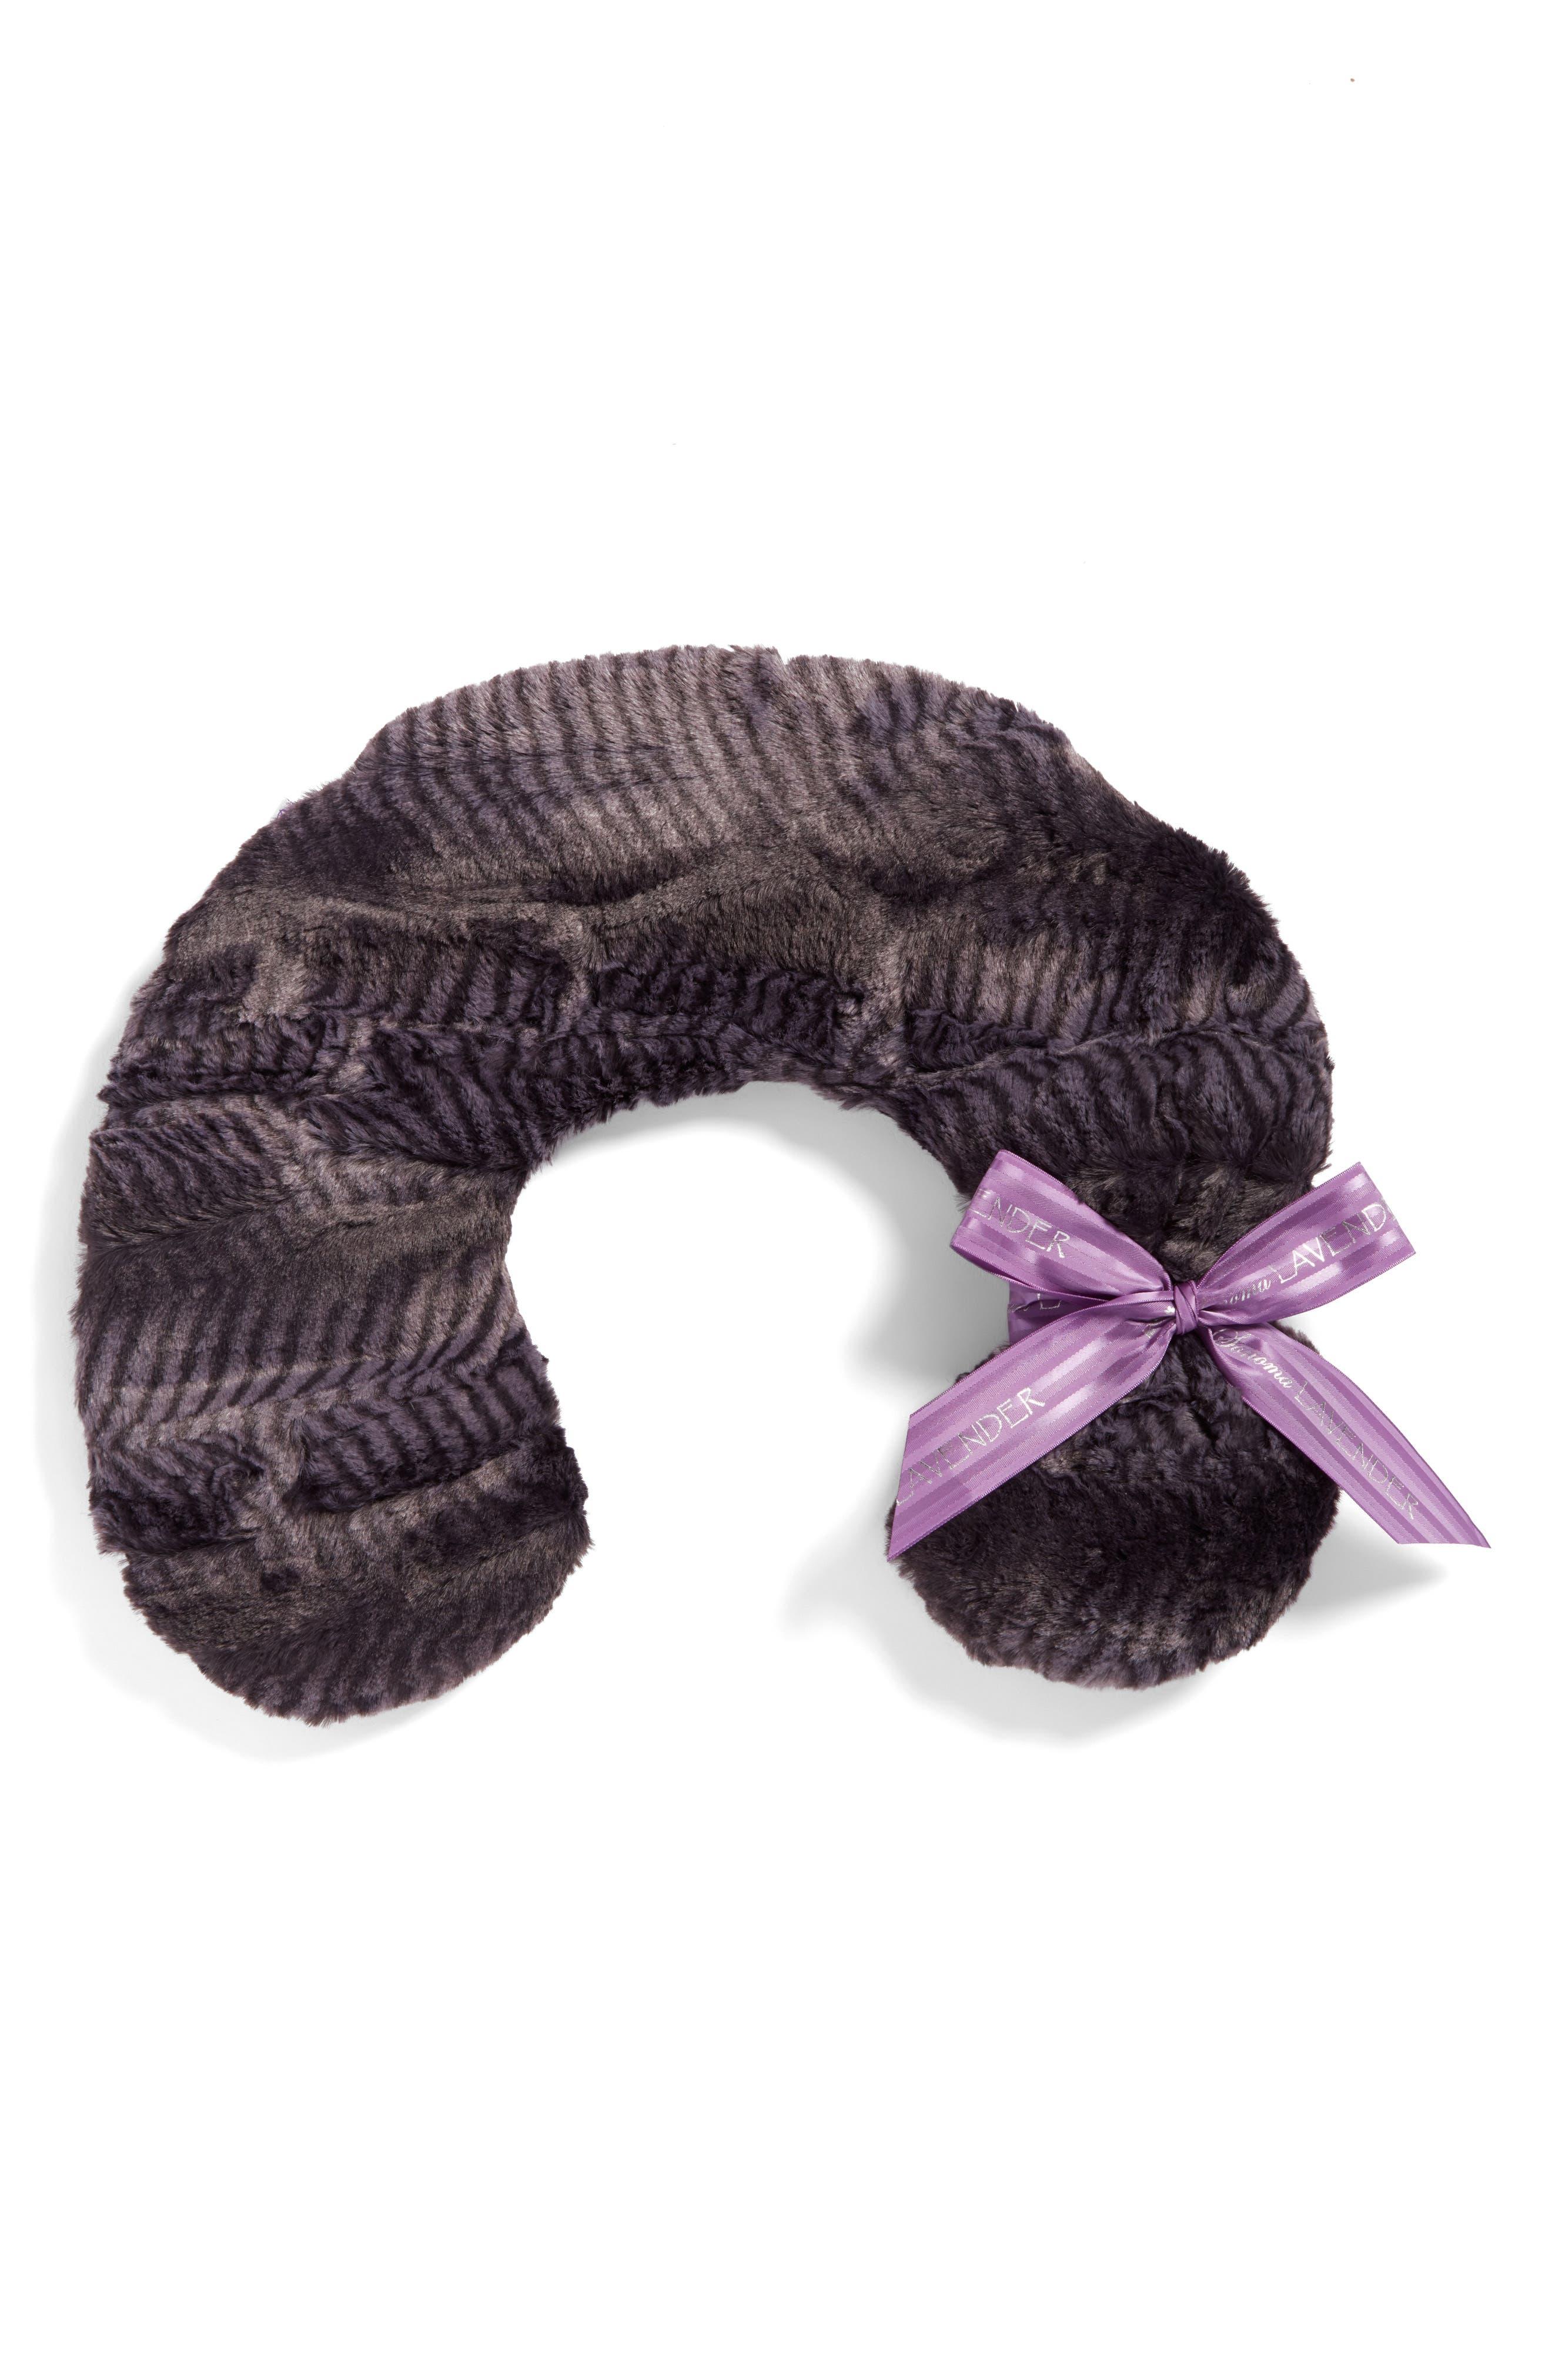 Sonoma Lavender Mamba Black Neck Pillow